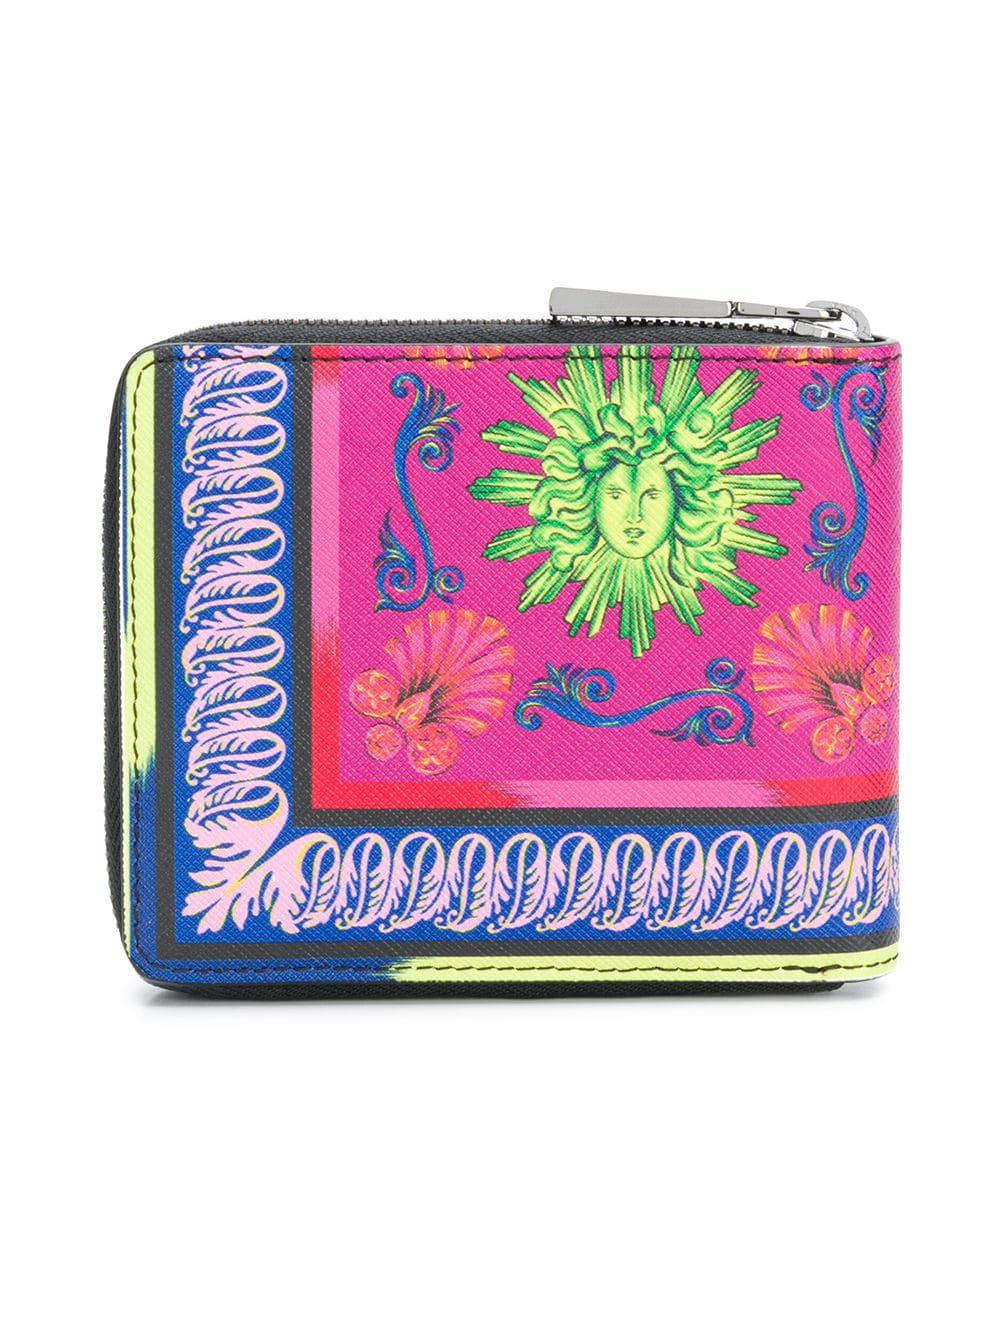 ... new authentic 47953 74379 Versace - Black Baroque Zipped Wallet for Men  - Lyst. a032ce6d48